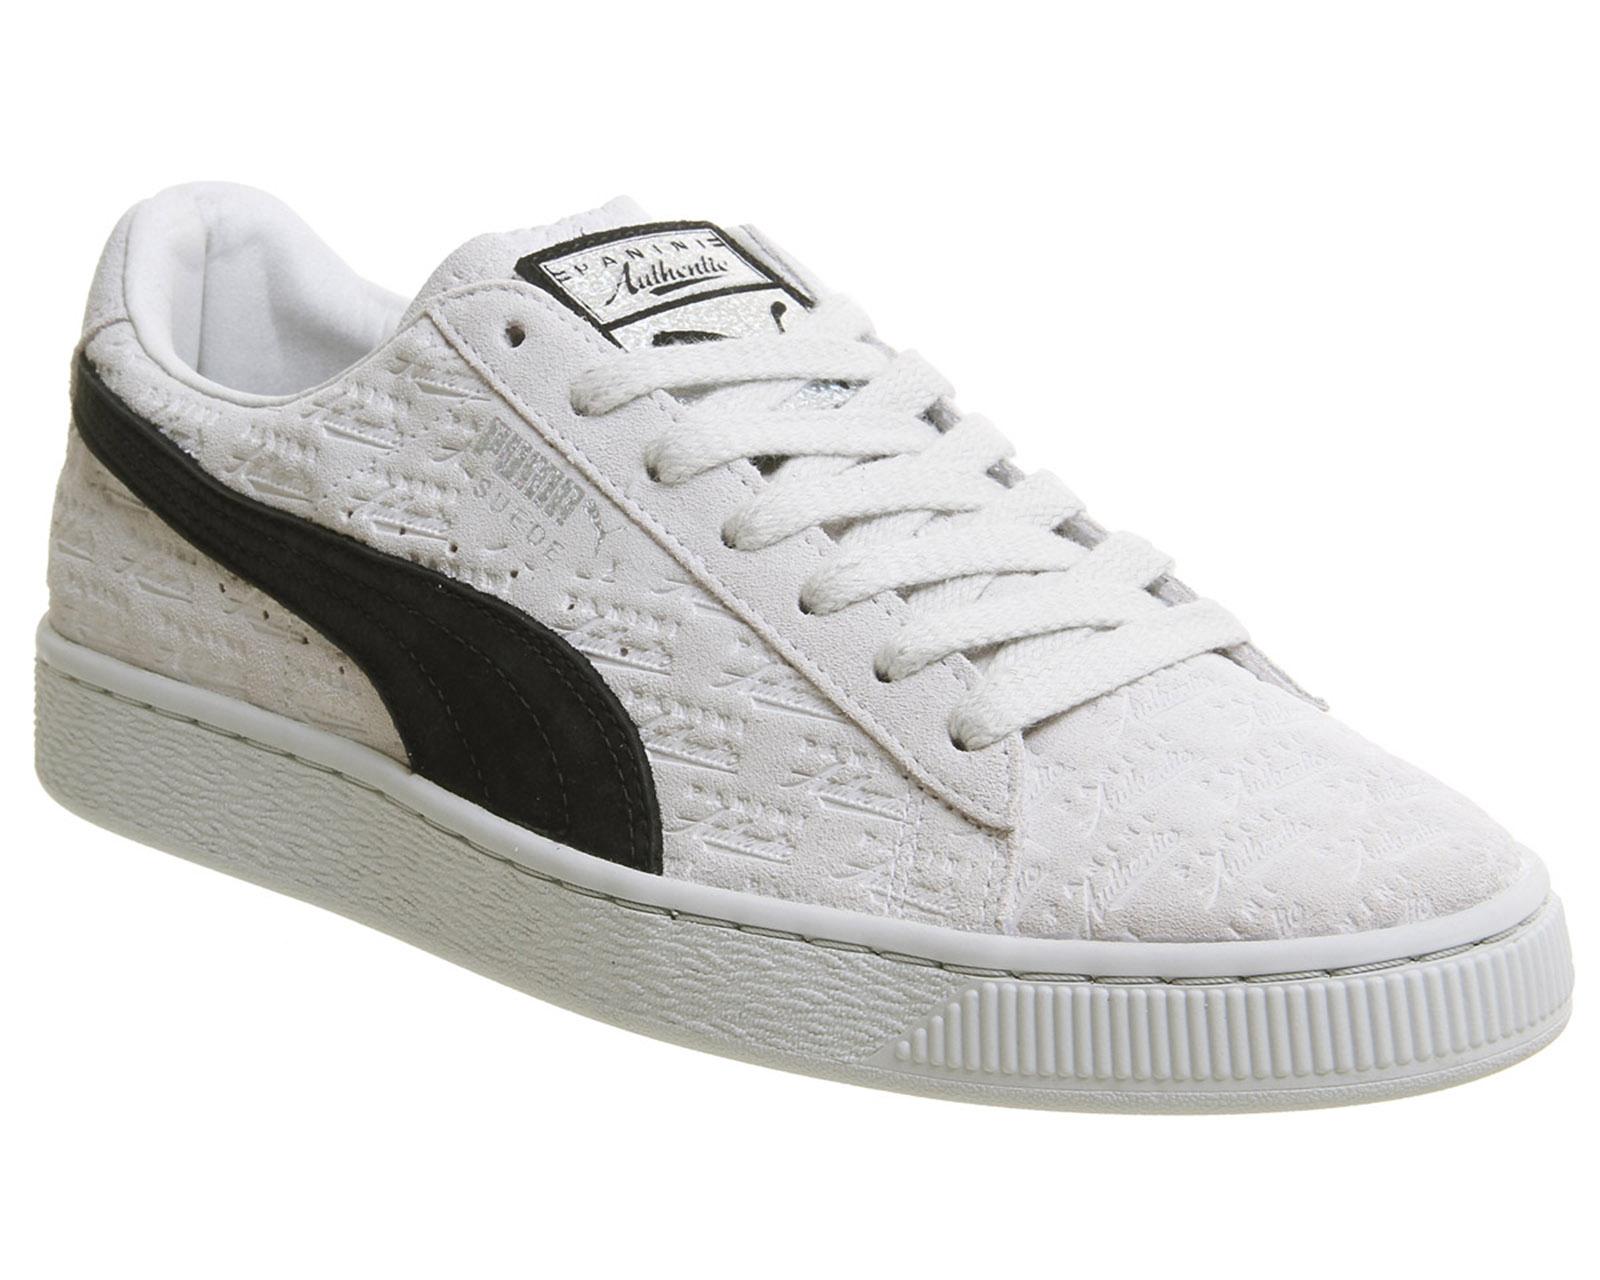 6cb405a100c4c2 Sentinel Puma Suede Classic Trainers Panini White Black Trainers Shoes